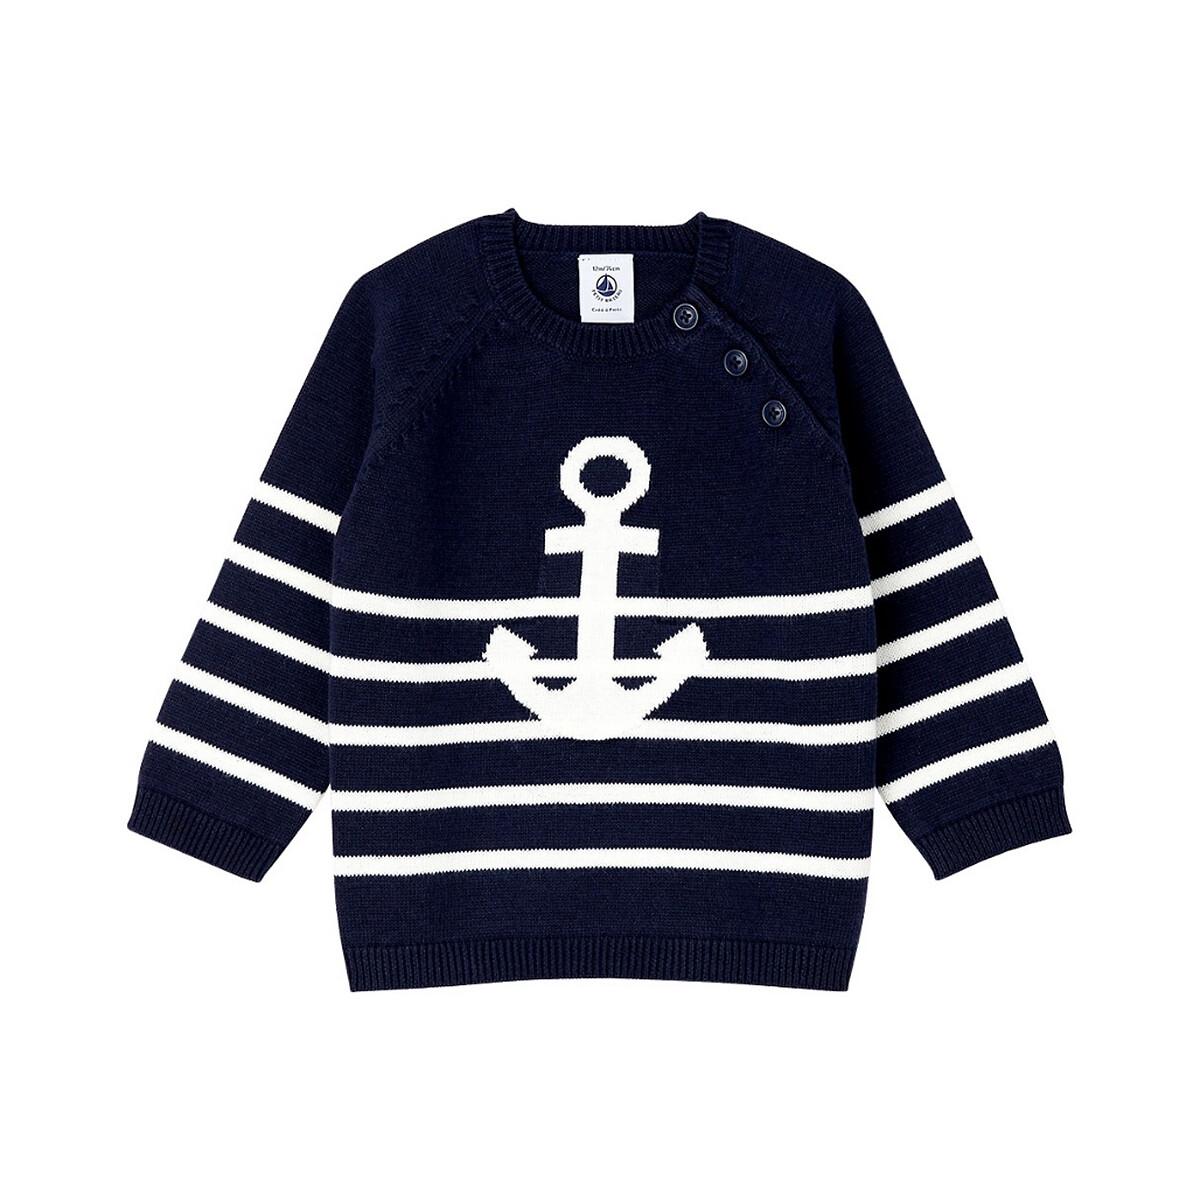 PETIT BATEAU - Petit Bateau Camisola estilo marinheiro, 6 meses-3 anos